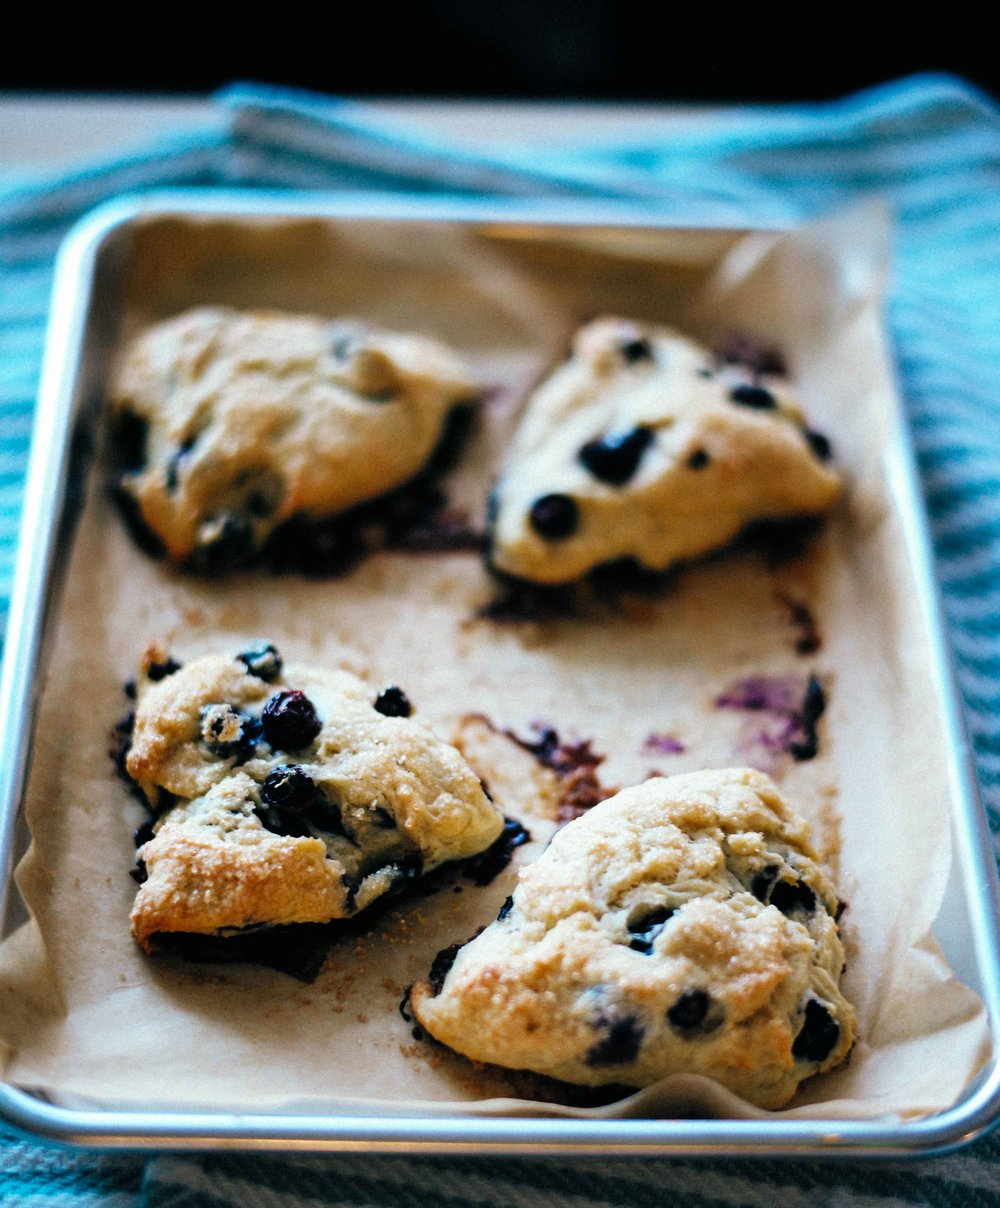 Crunchy, satisfying, light dairy-free vegan scones